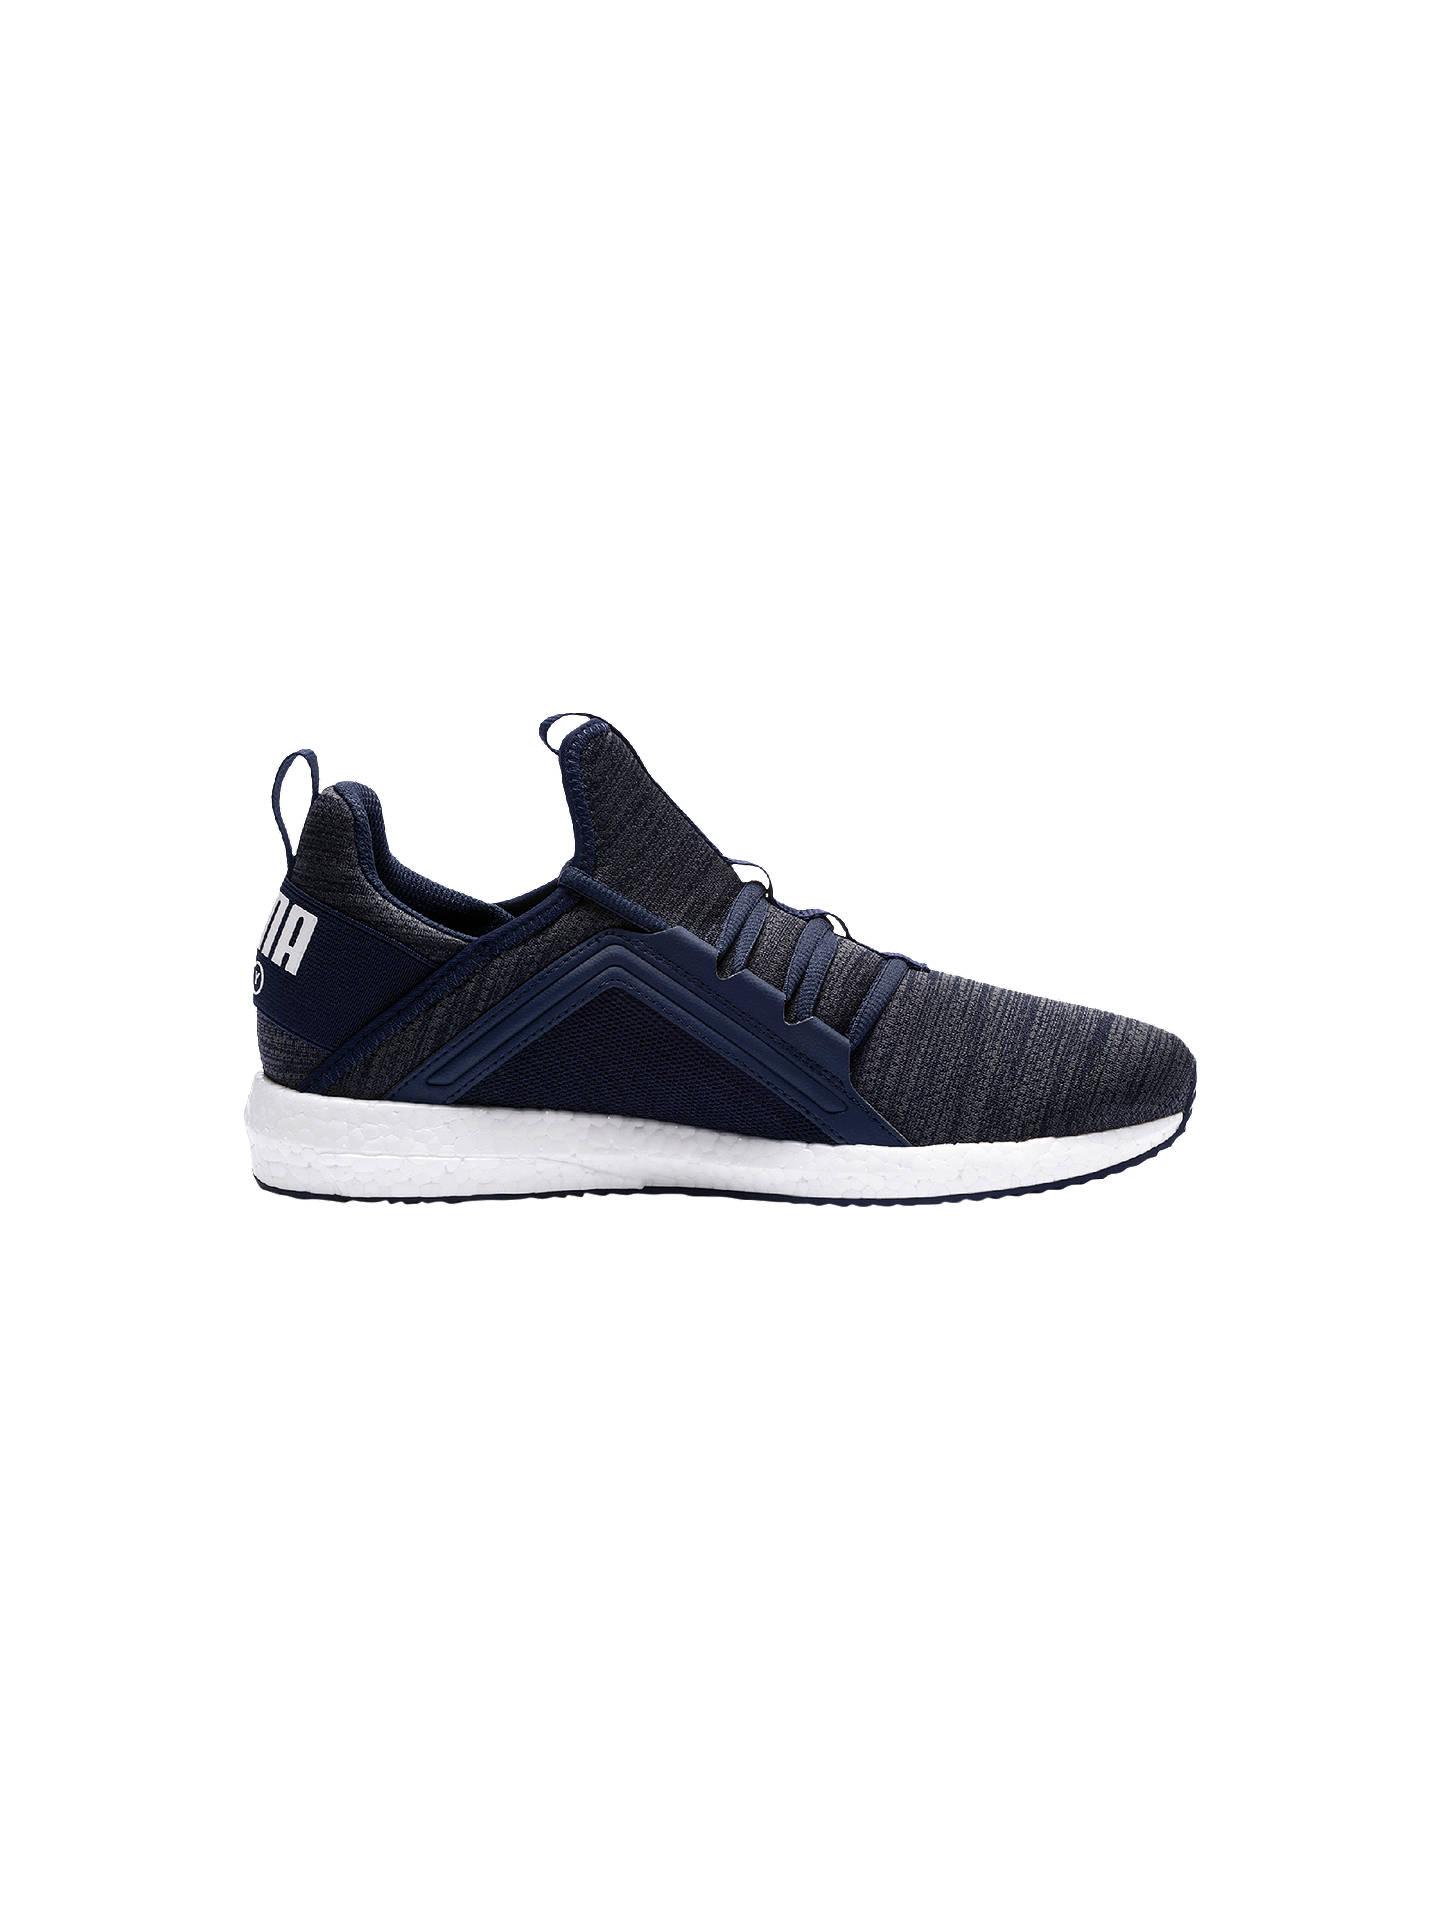 d1e6ff6b8939 BuyPUMA NRGY Neko Knit Men s Running Shoes